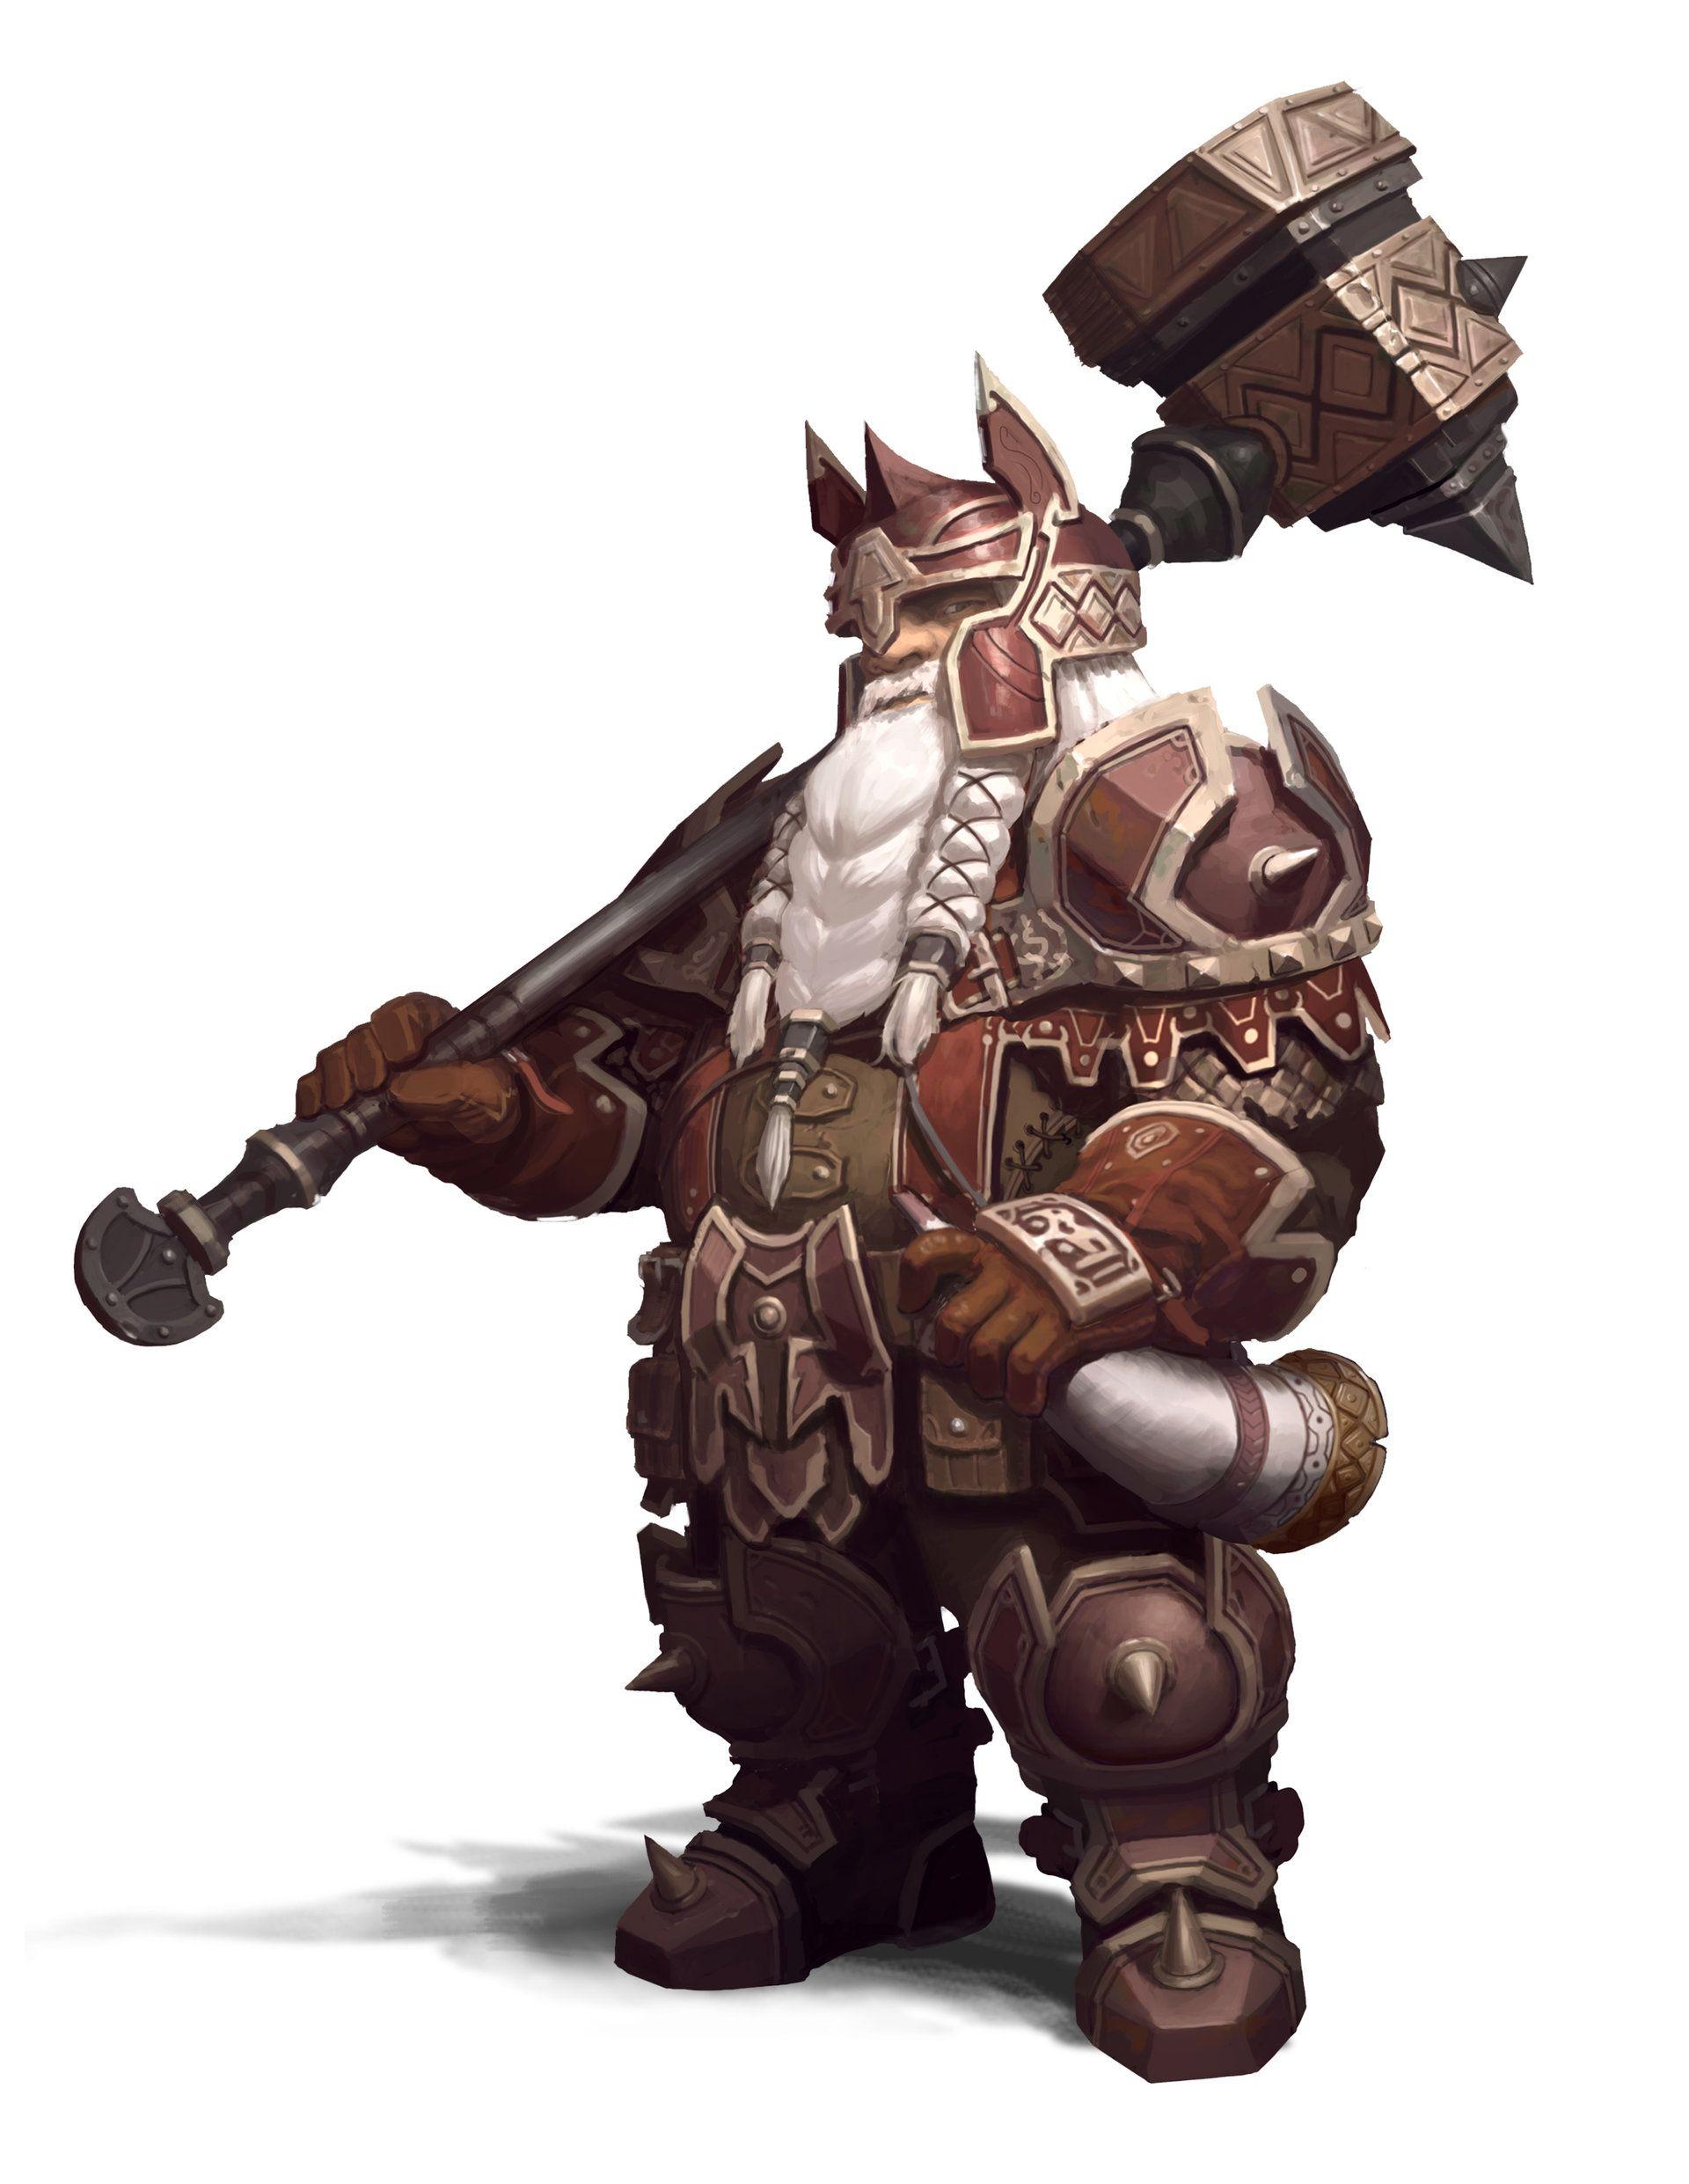 dwarf by Hyeon Gwan Nam (ArtStation) | Male Dwarf Fighter with Hammer